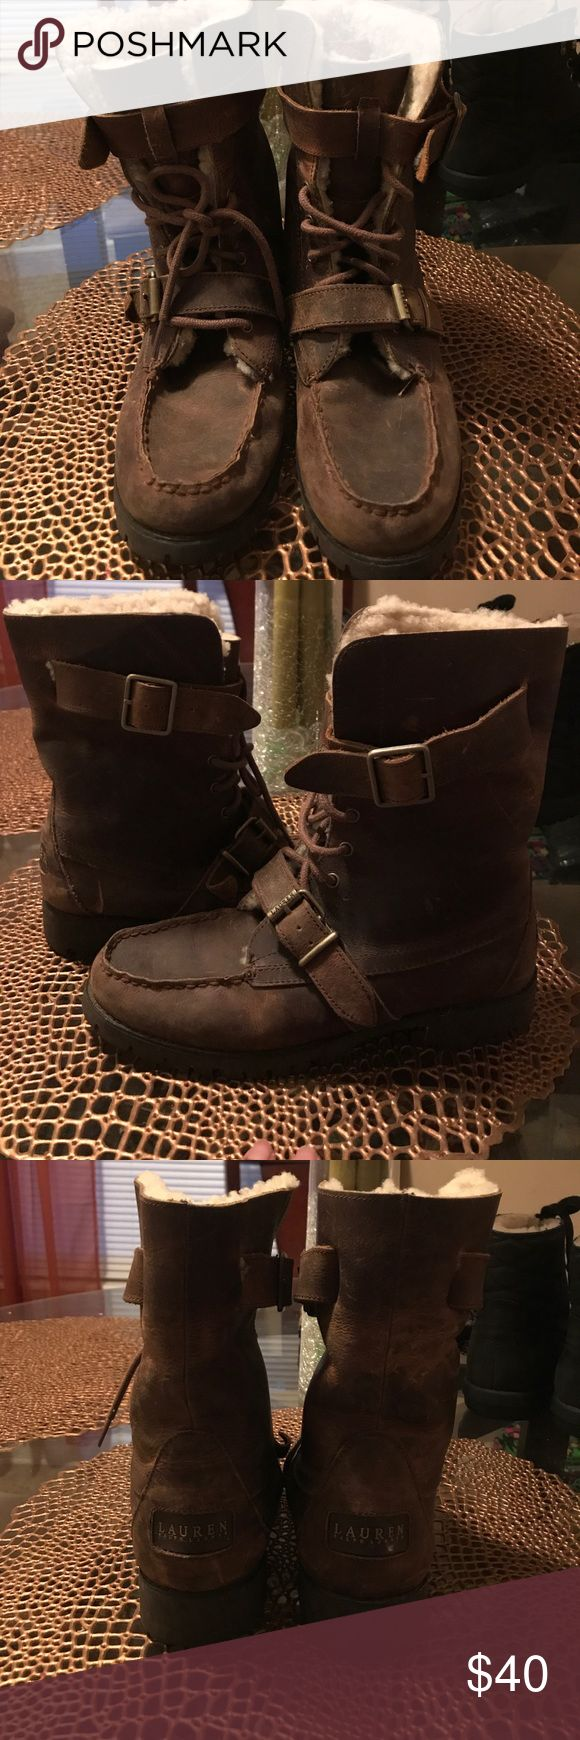 Ralph Luaren leather boots Brown leather boots Lauren Ralph Lauren Shoes Winter & Rain Boots